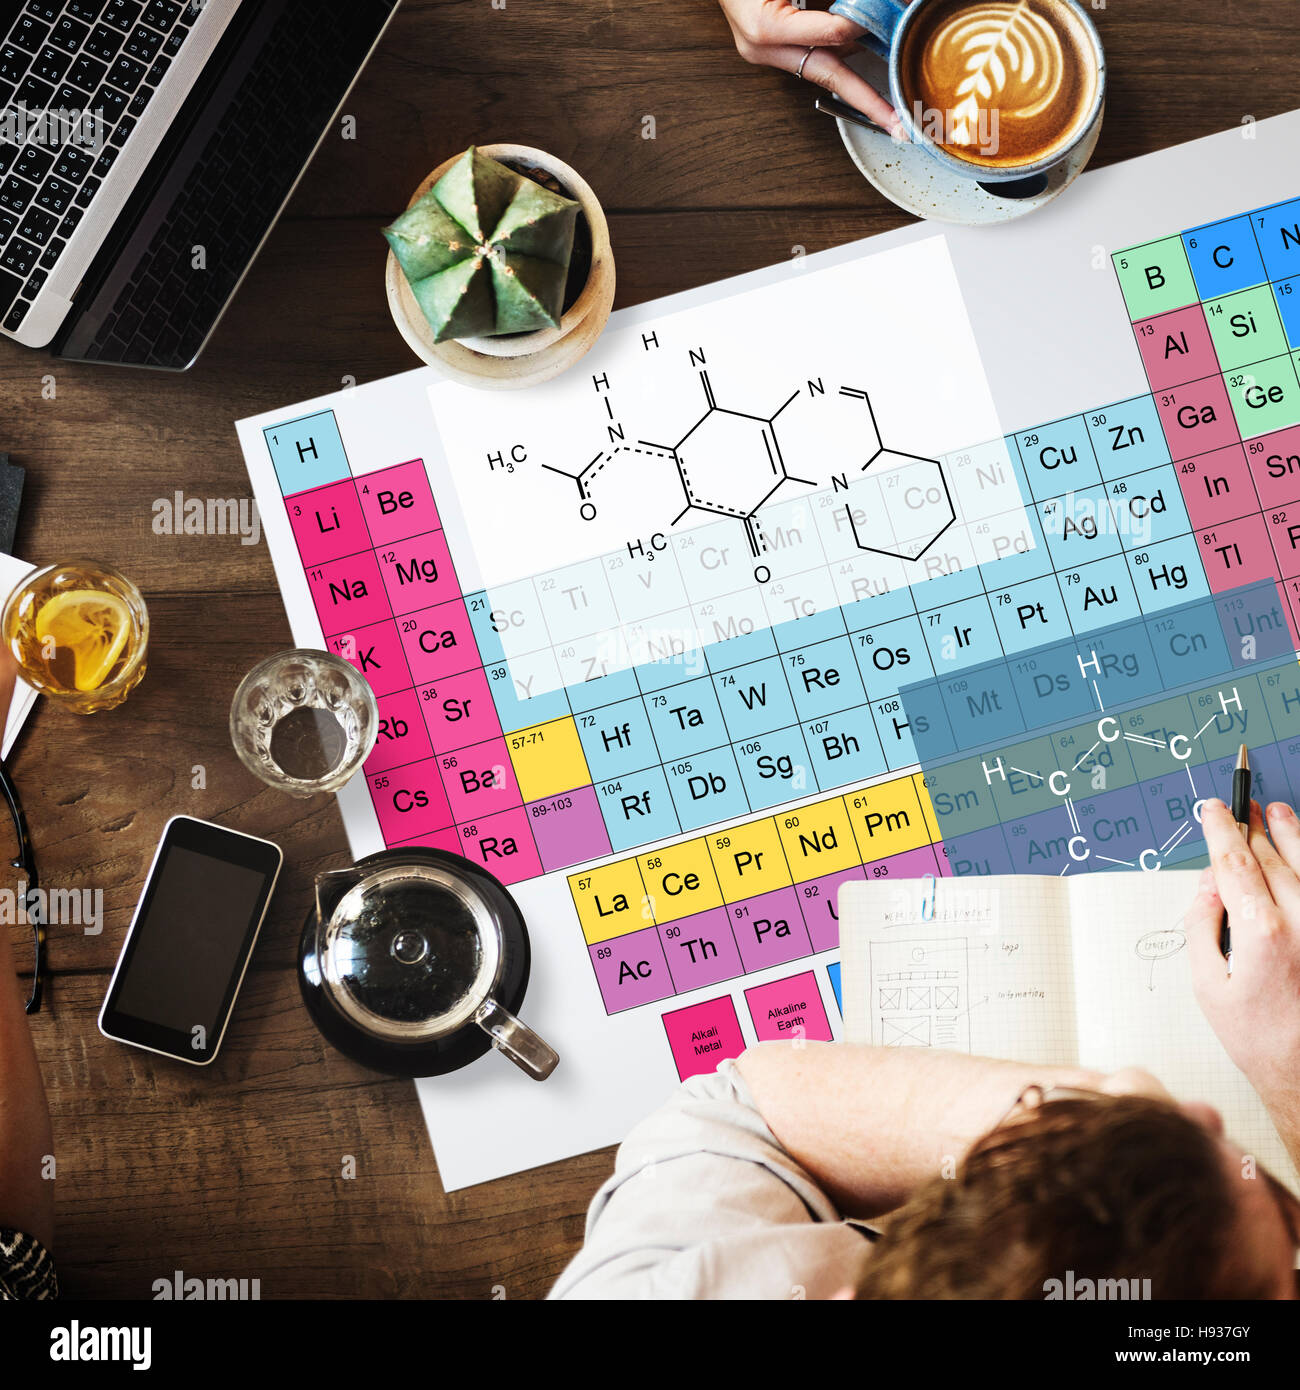 Tabla peridica qumica qumica mendeleev concepto foto imagen de tabla peridica qumica qumica mendeleev concepto foto imagen de stock 126076299 alamy urtaz Images